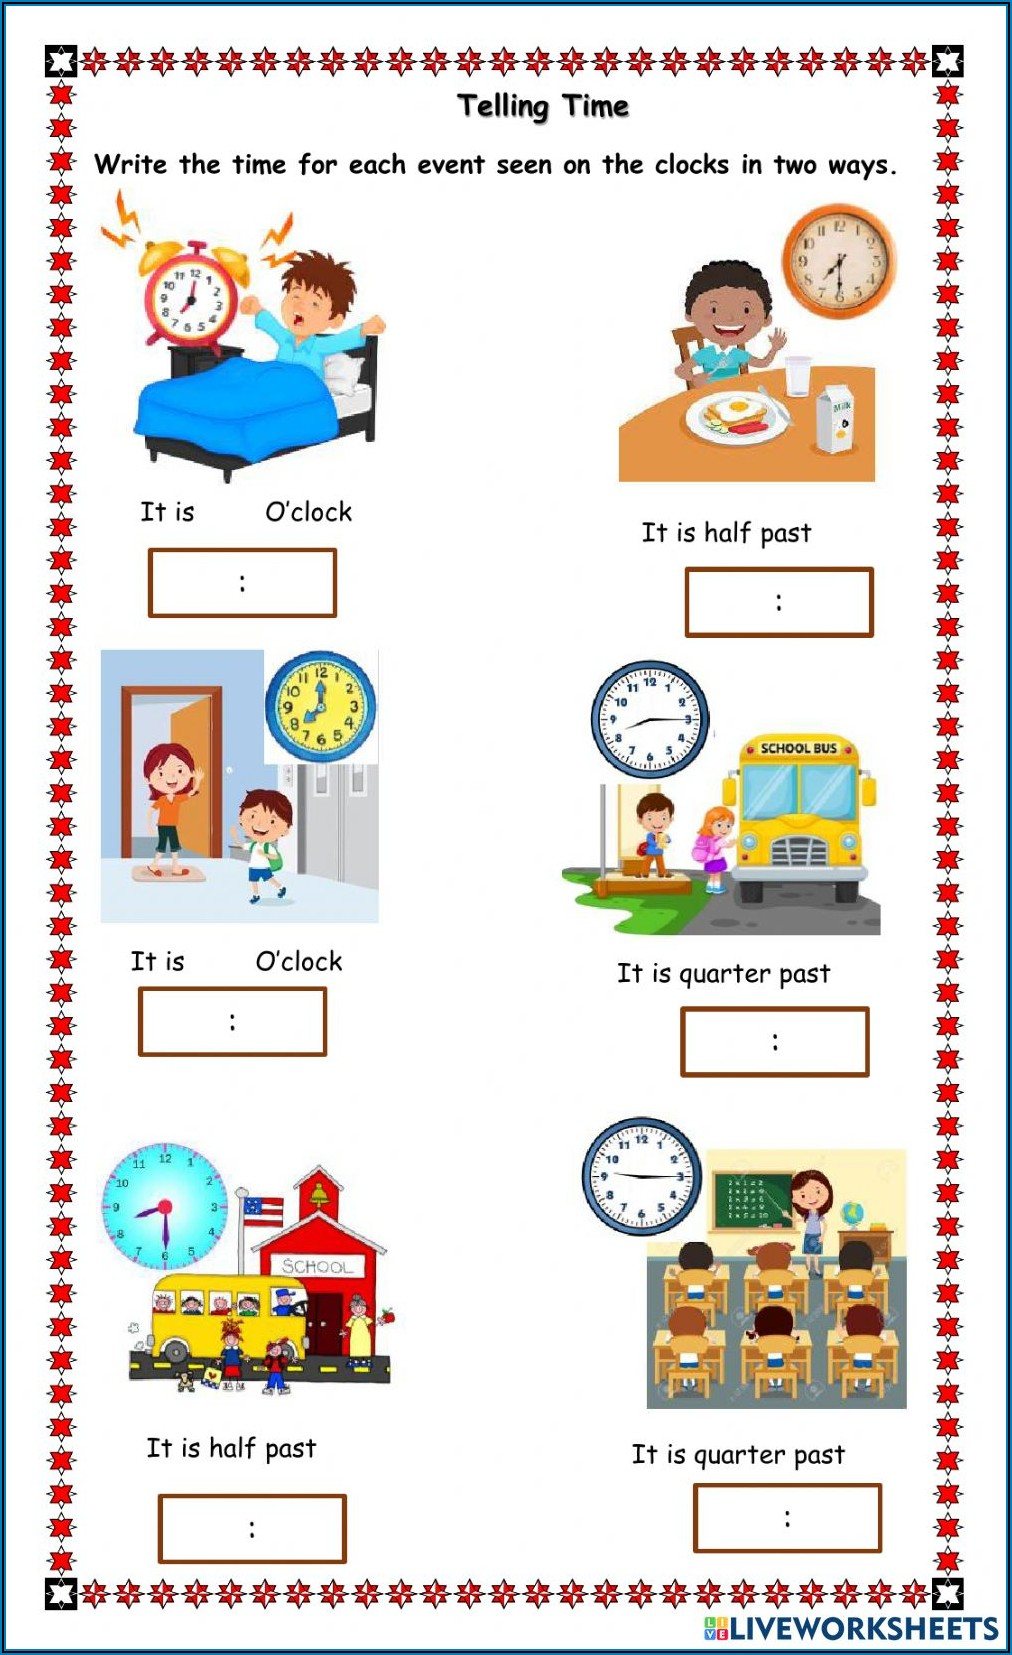 Telling Time In Two Ways Worksheet